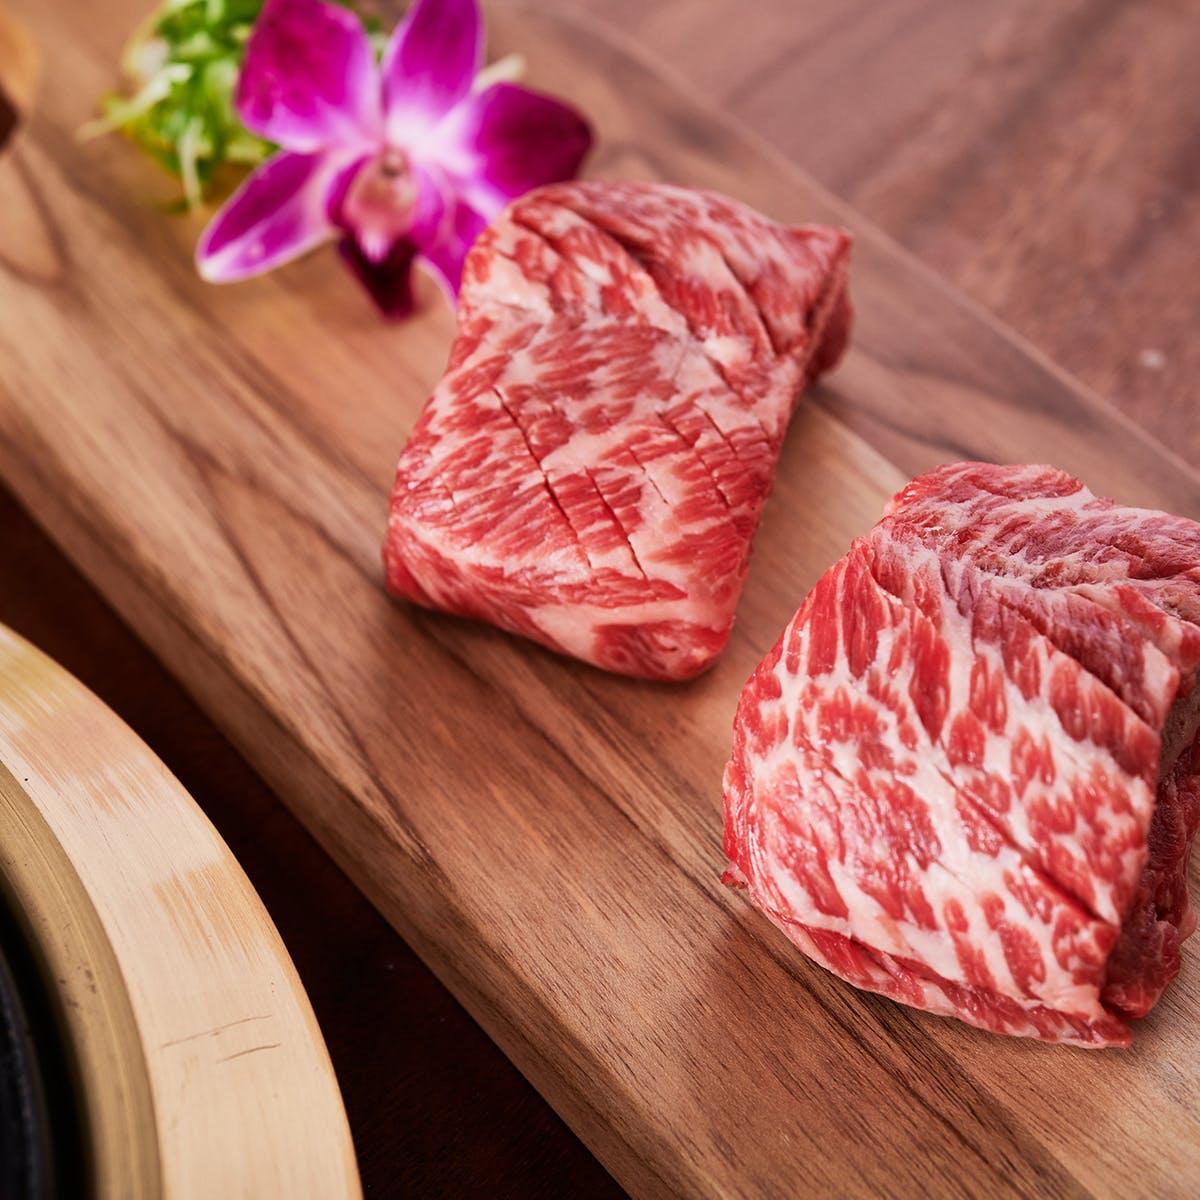 Samwon Garden Korean BBQ - Korean BBQ Galbi Beef Kit for 2-4